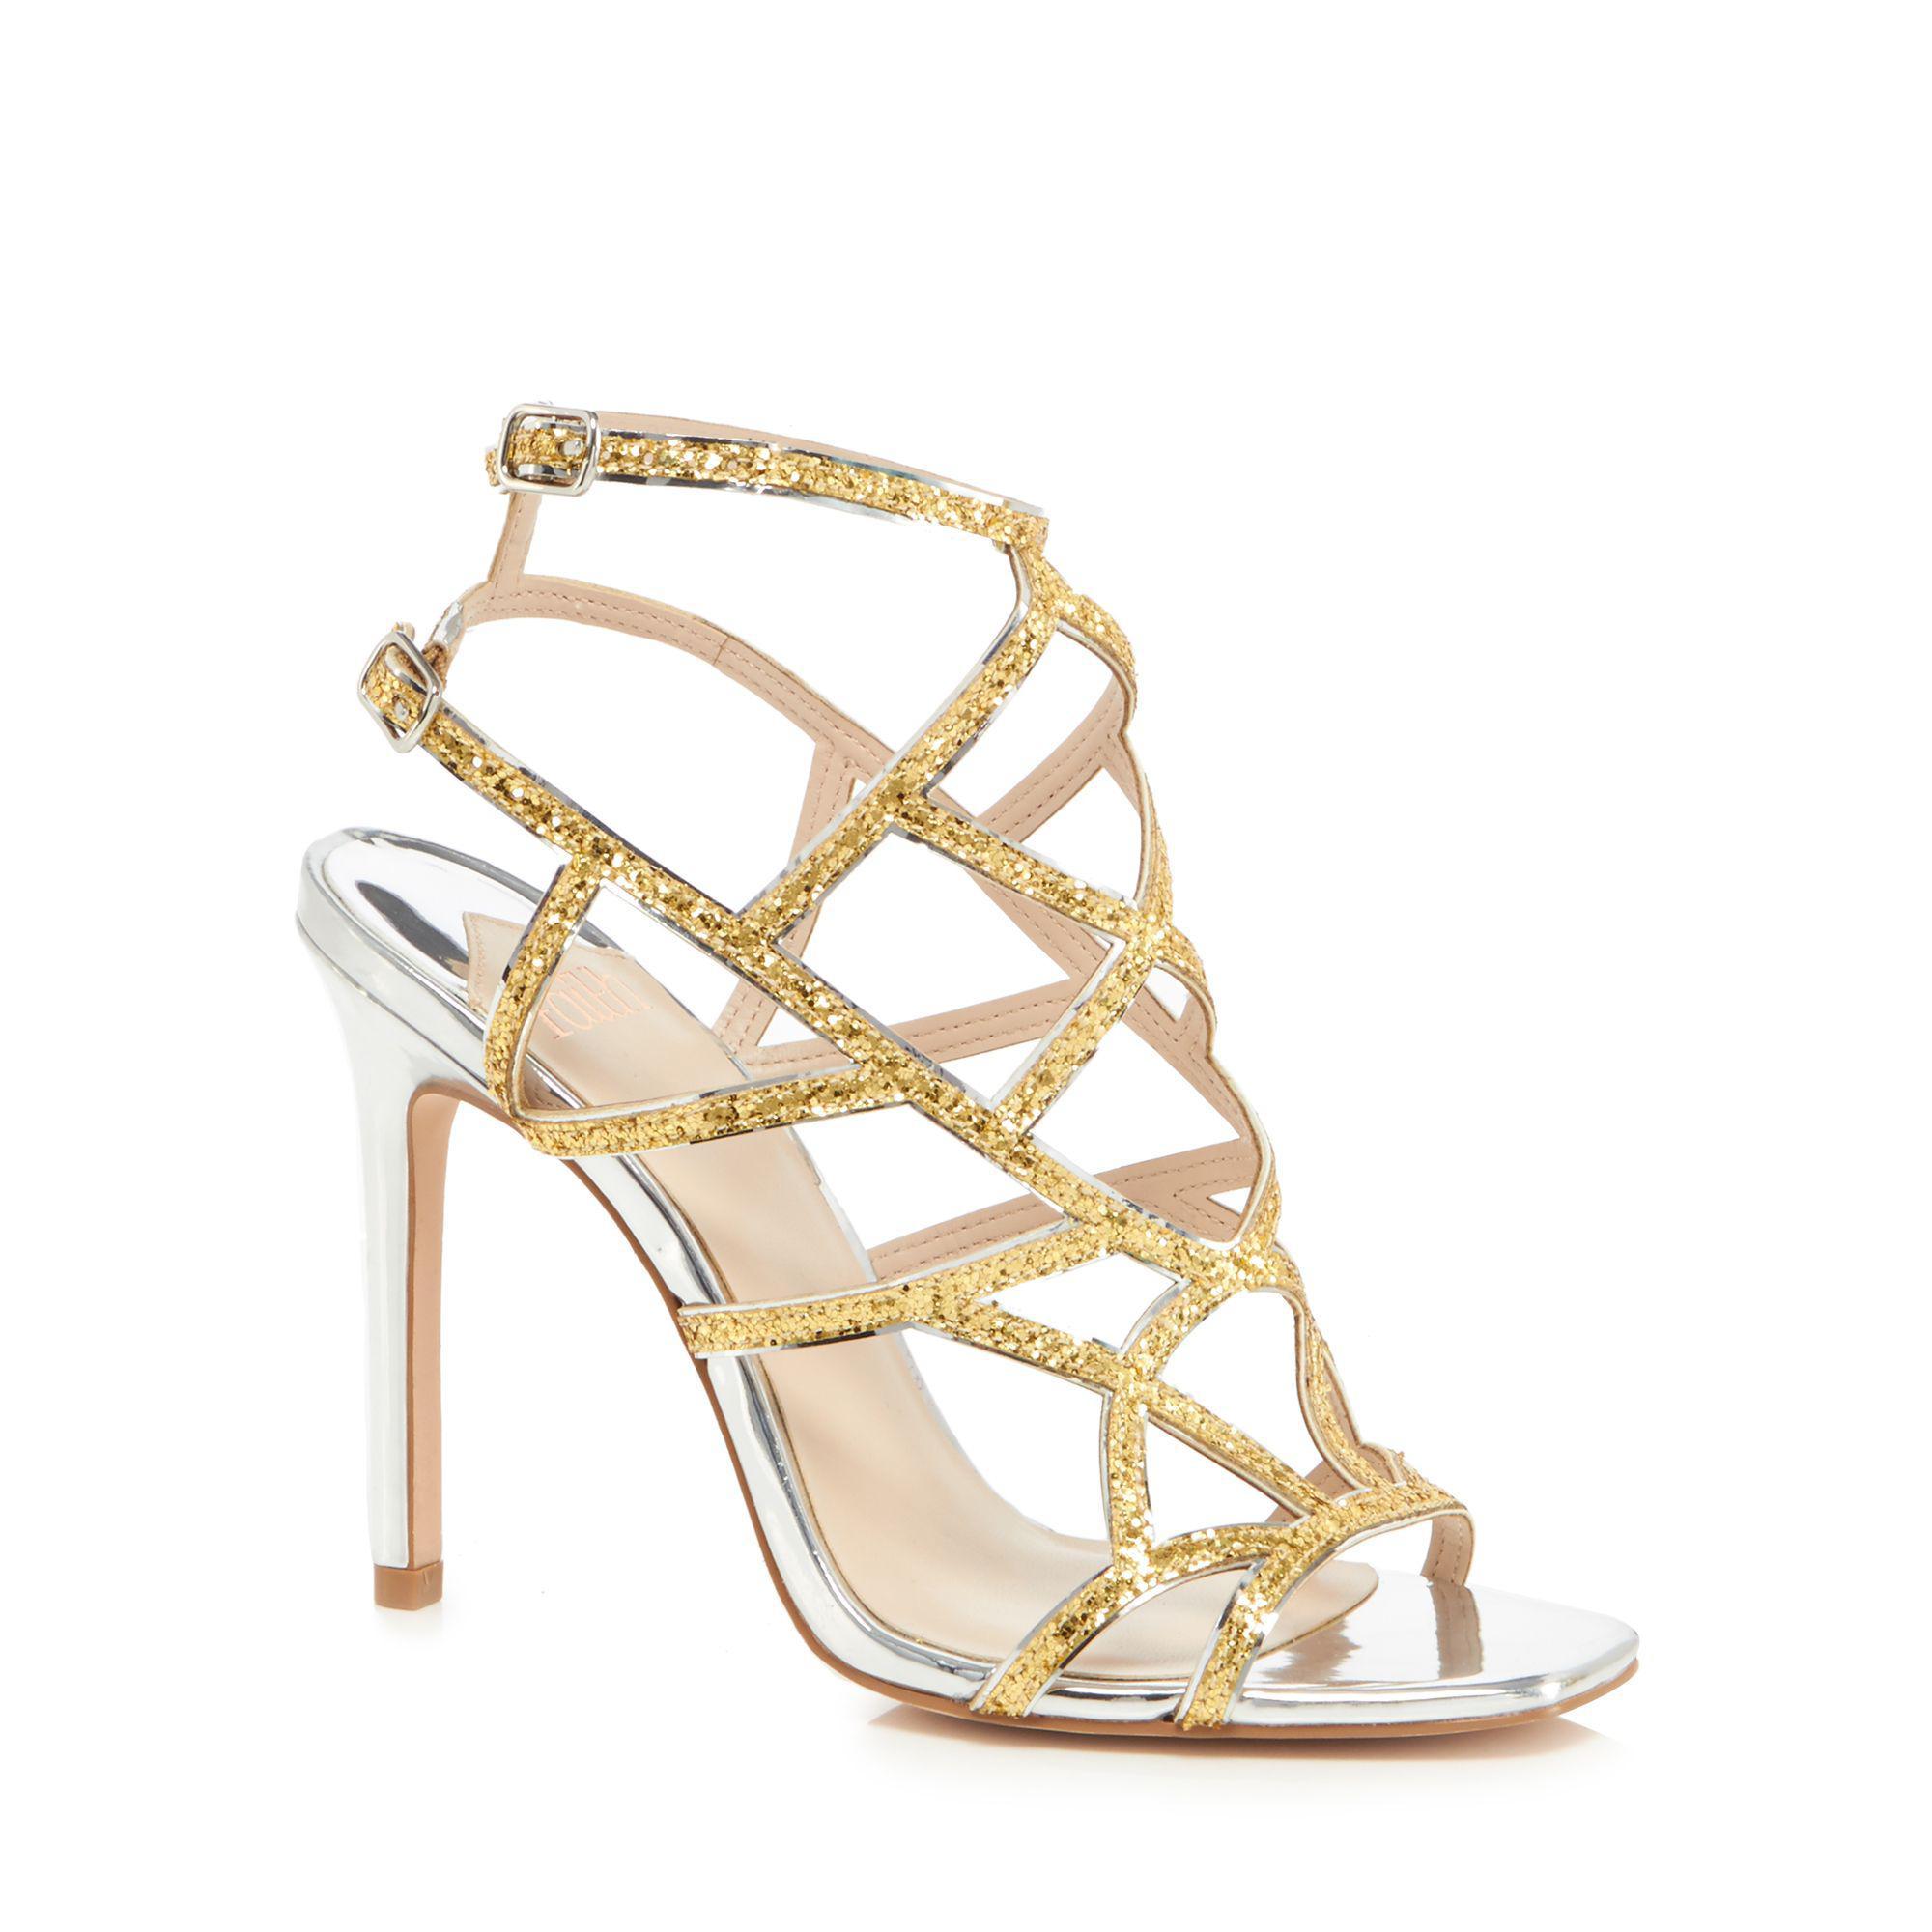 671cde400003 Faith Gold  latoya  High Stiletto Heel Ankle Strap Sandals in ...